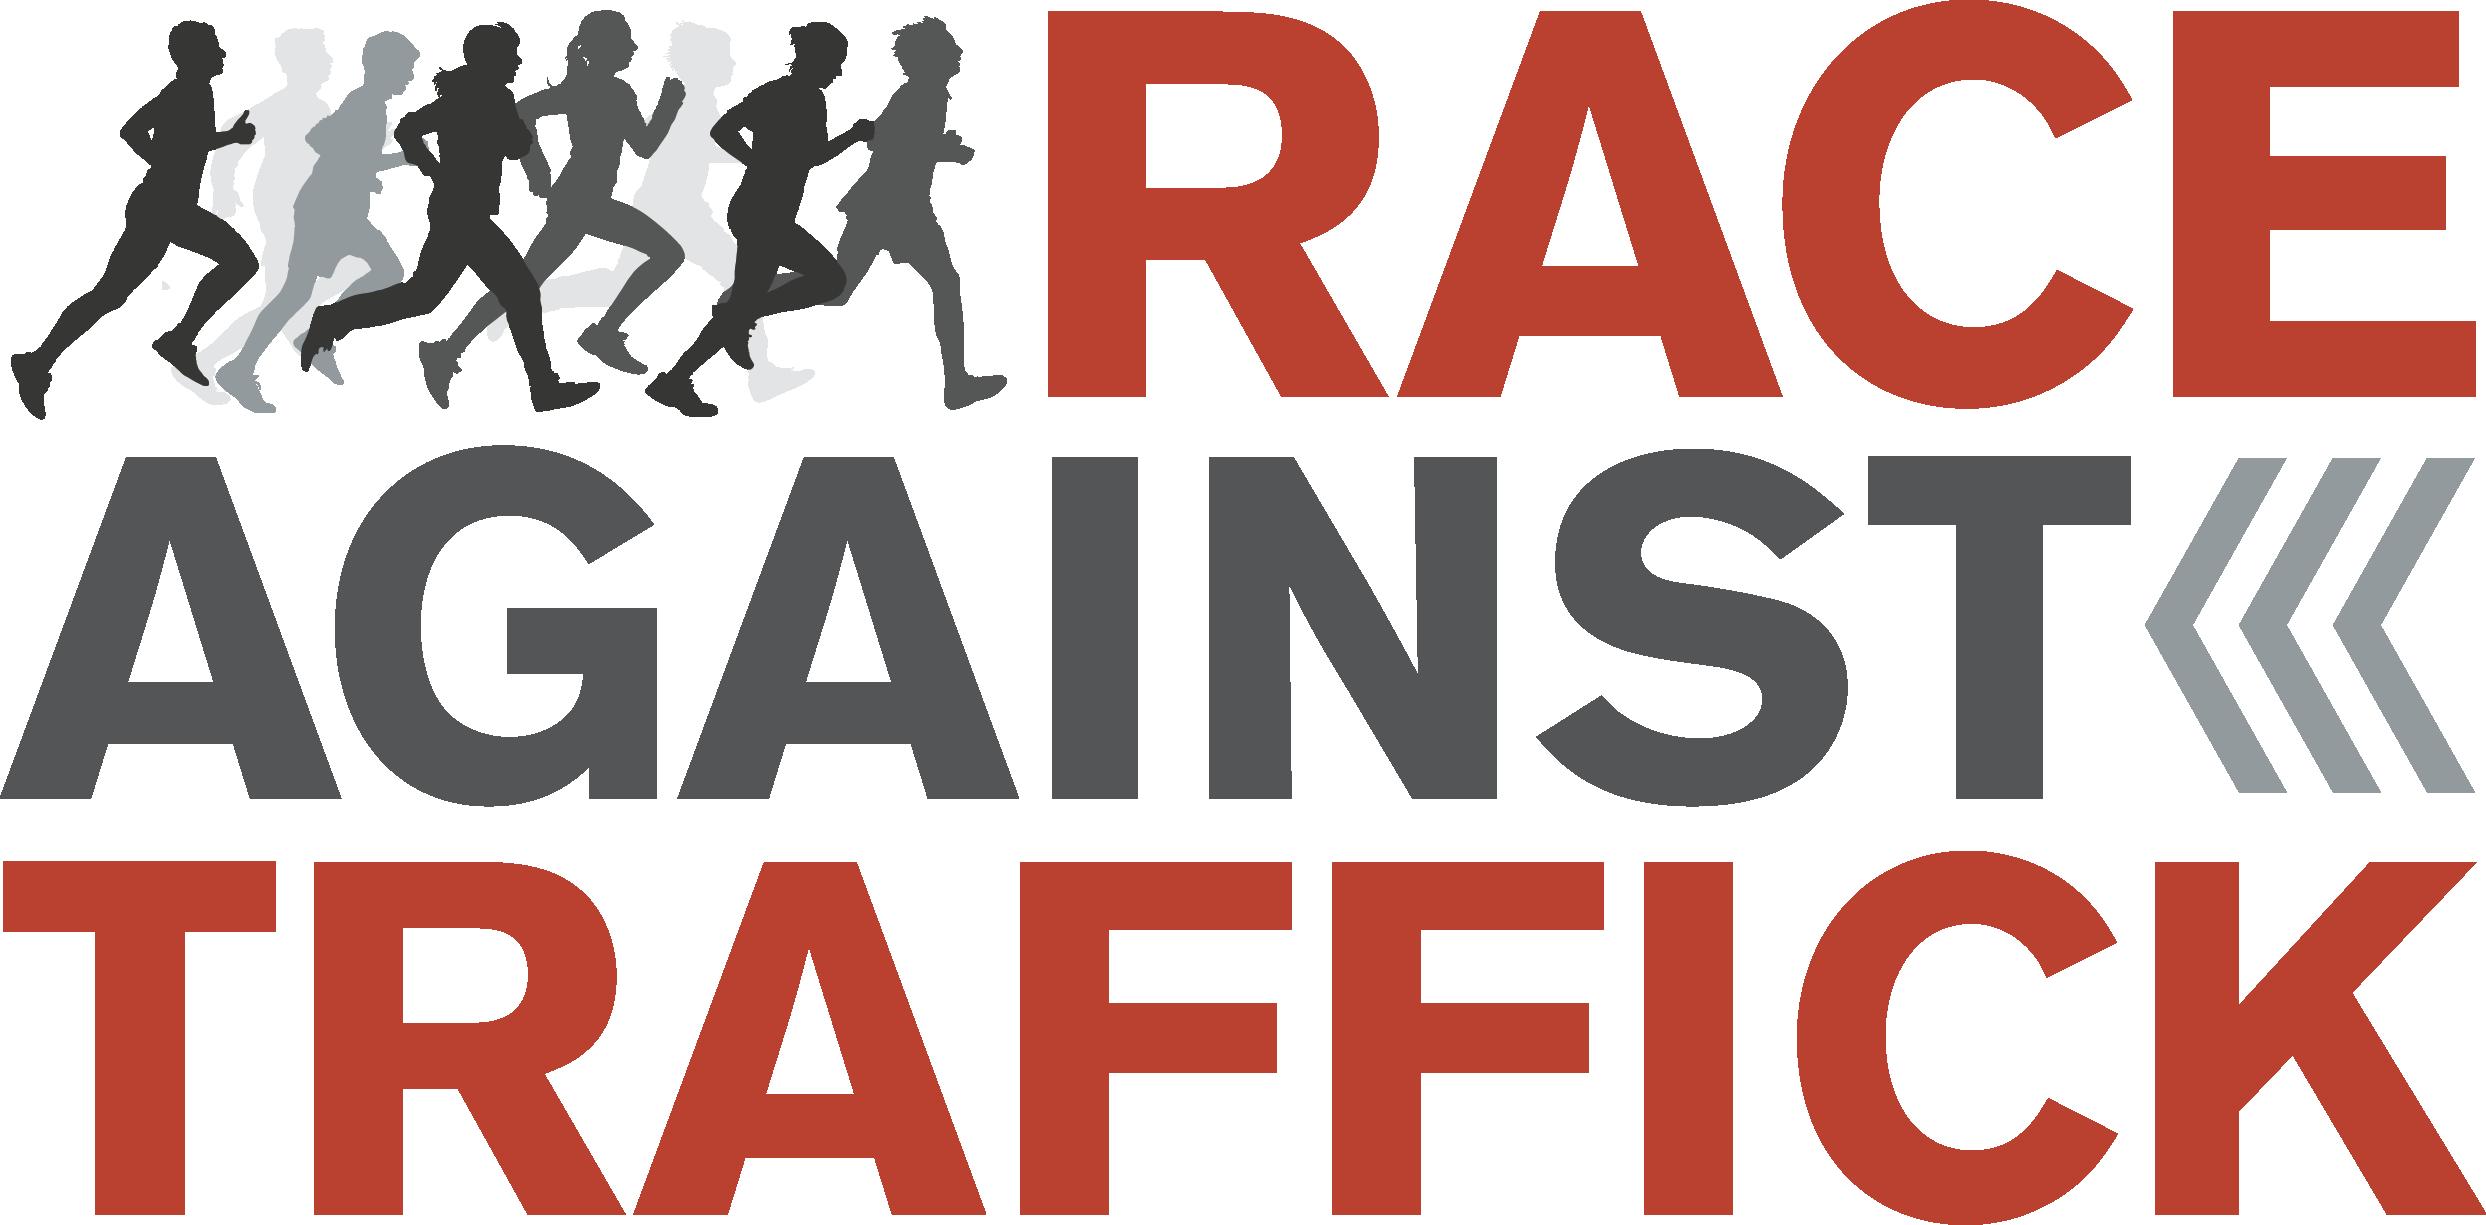 RACE AGAINST TRAFFICK